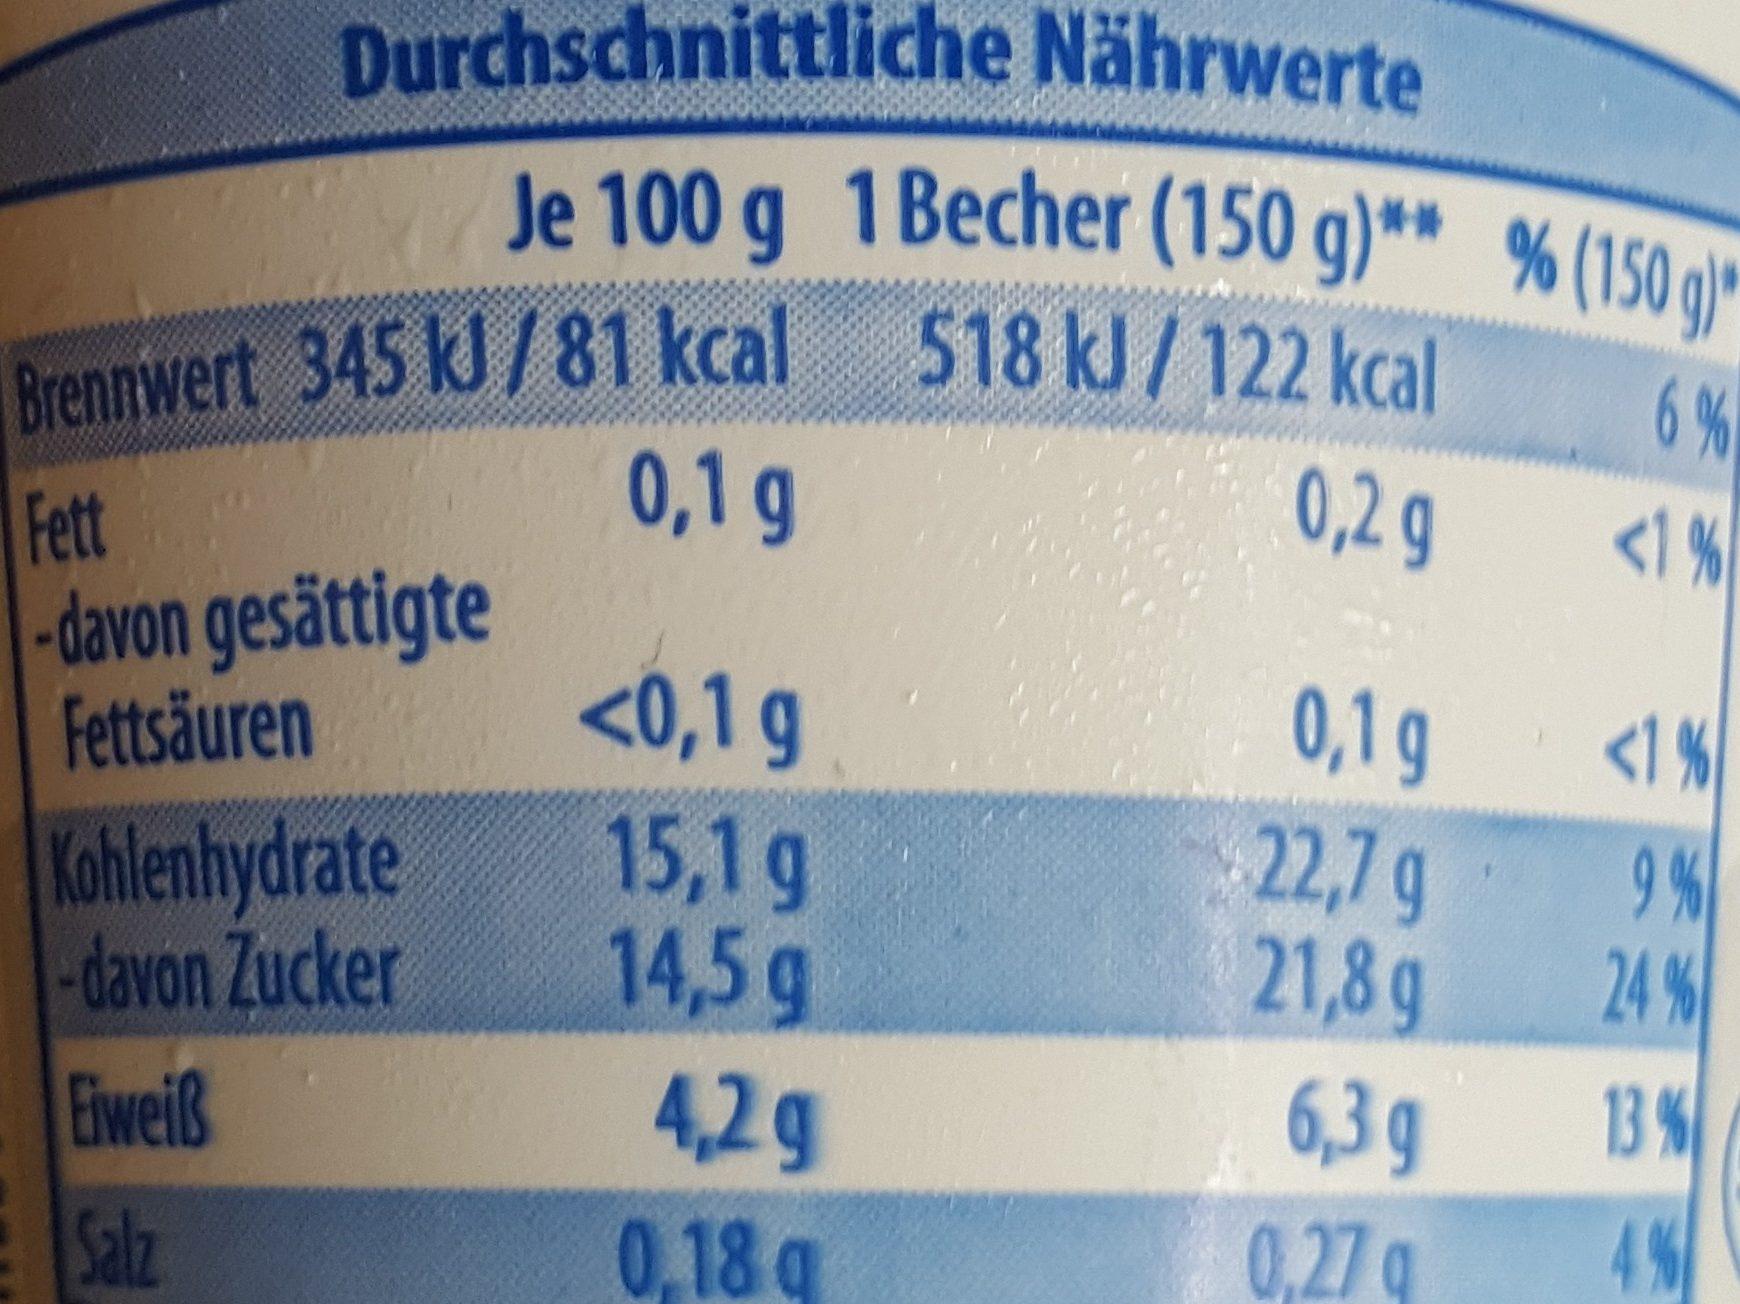 yaourt 0,1% myrtille - Nährwertangaben